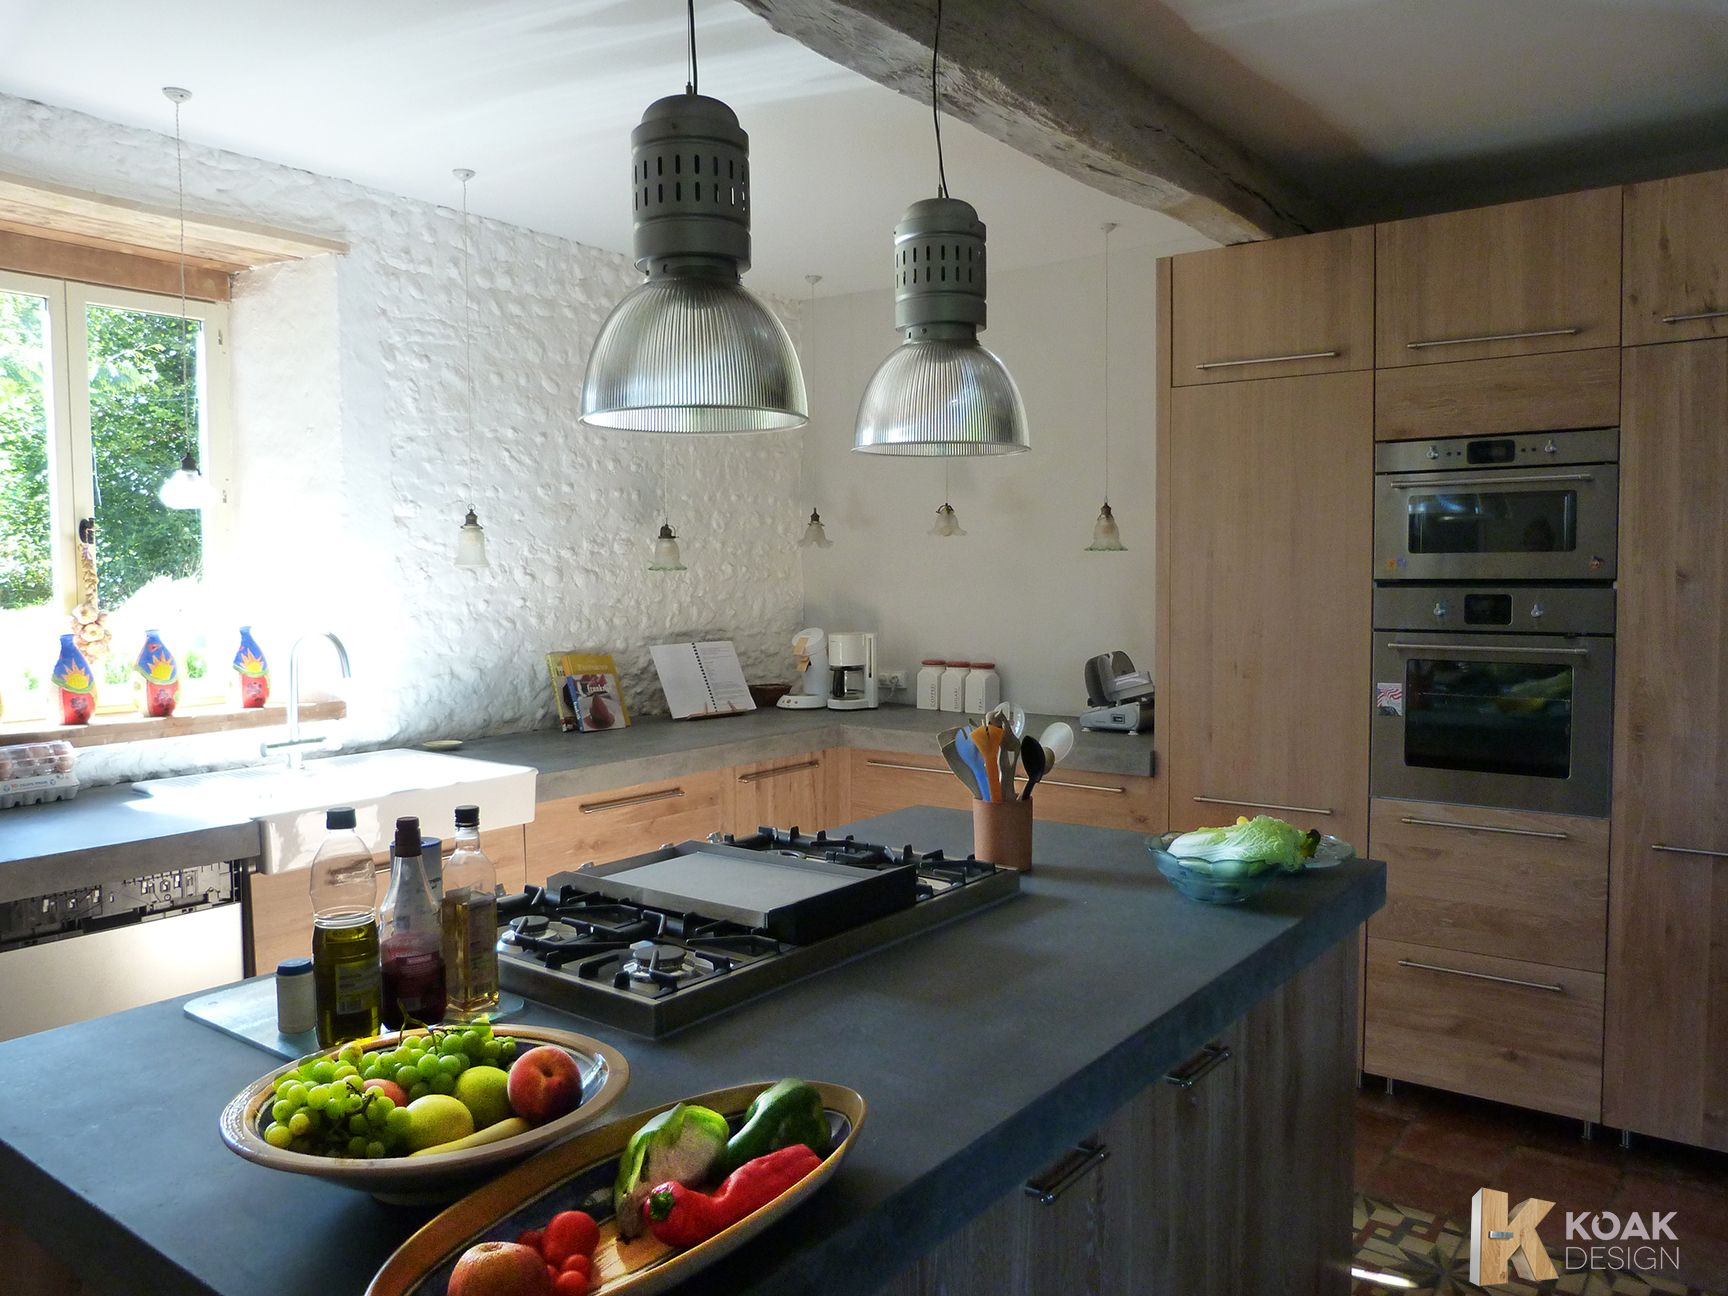 koak design massief houten keuken whitewash opgeruwd keukenblad donker beton ikeakitchen. Black Bedroom Furniture Sets. Home Design Ideas